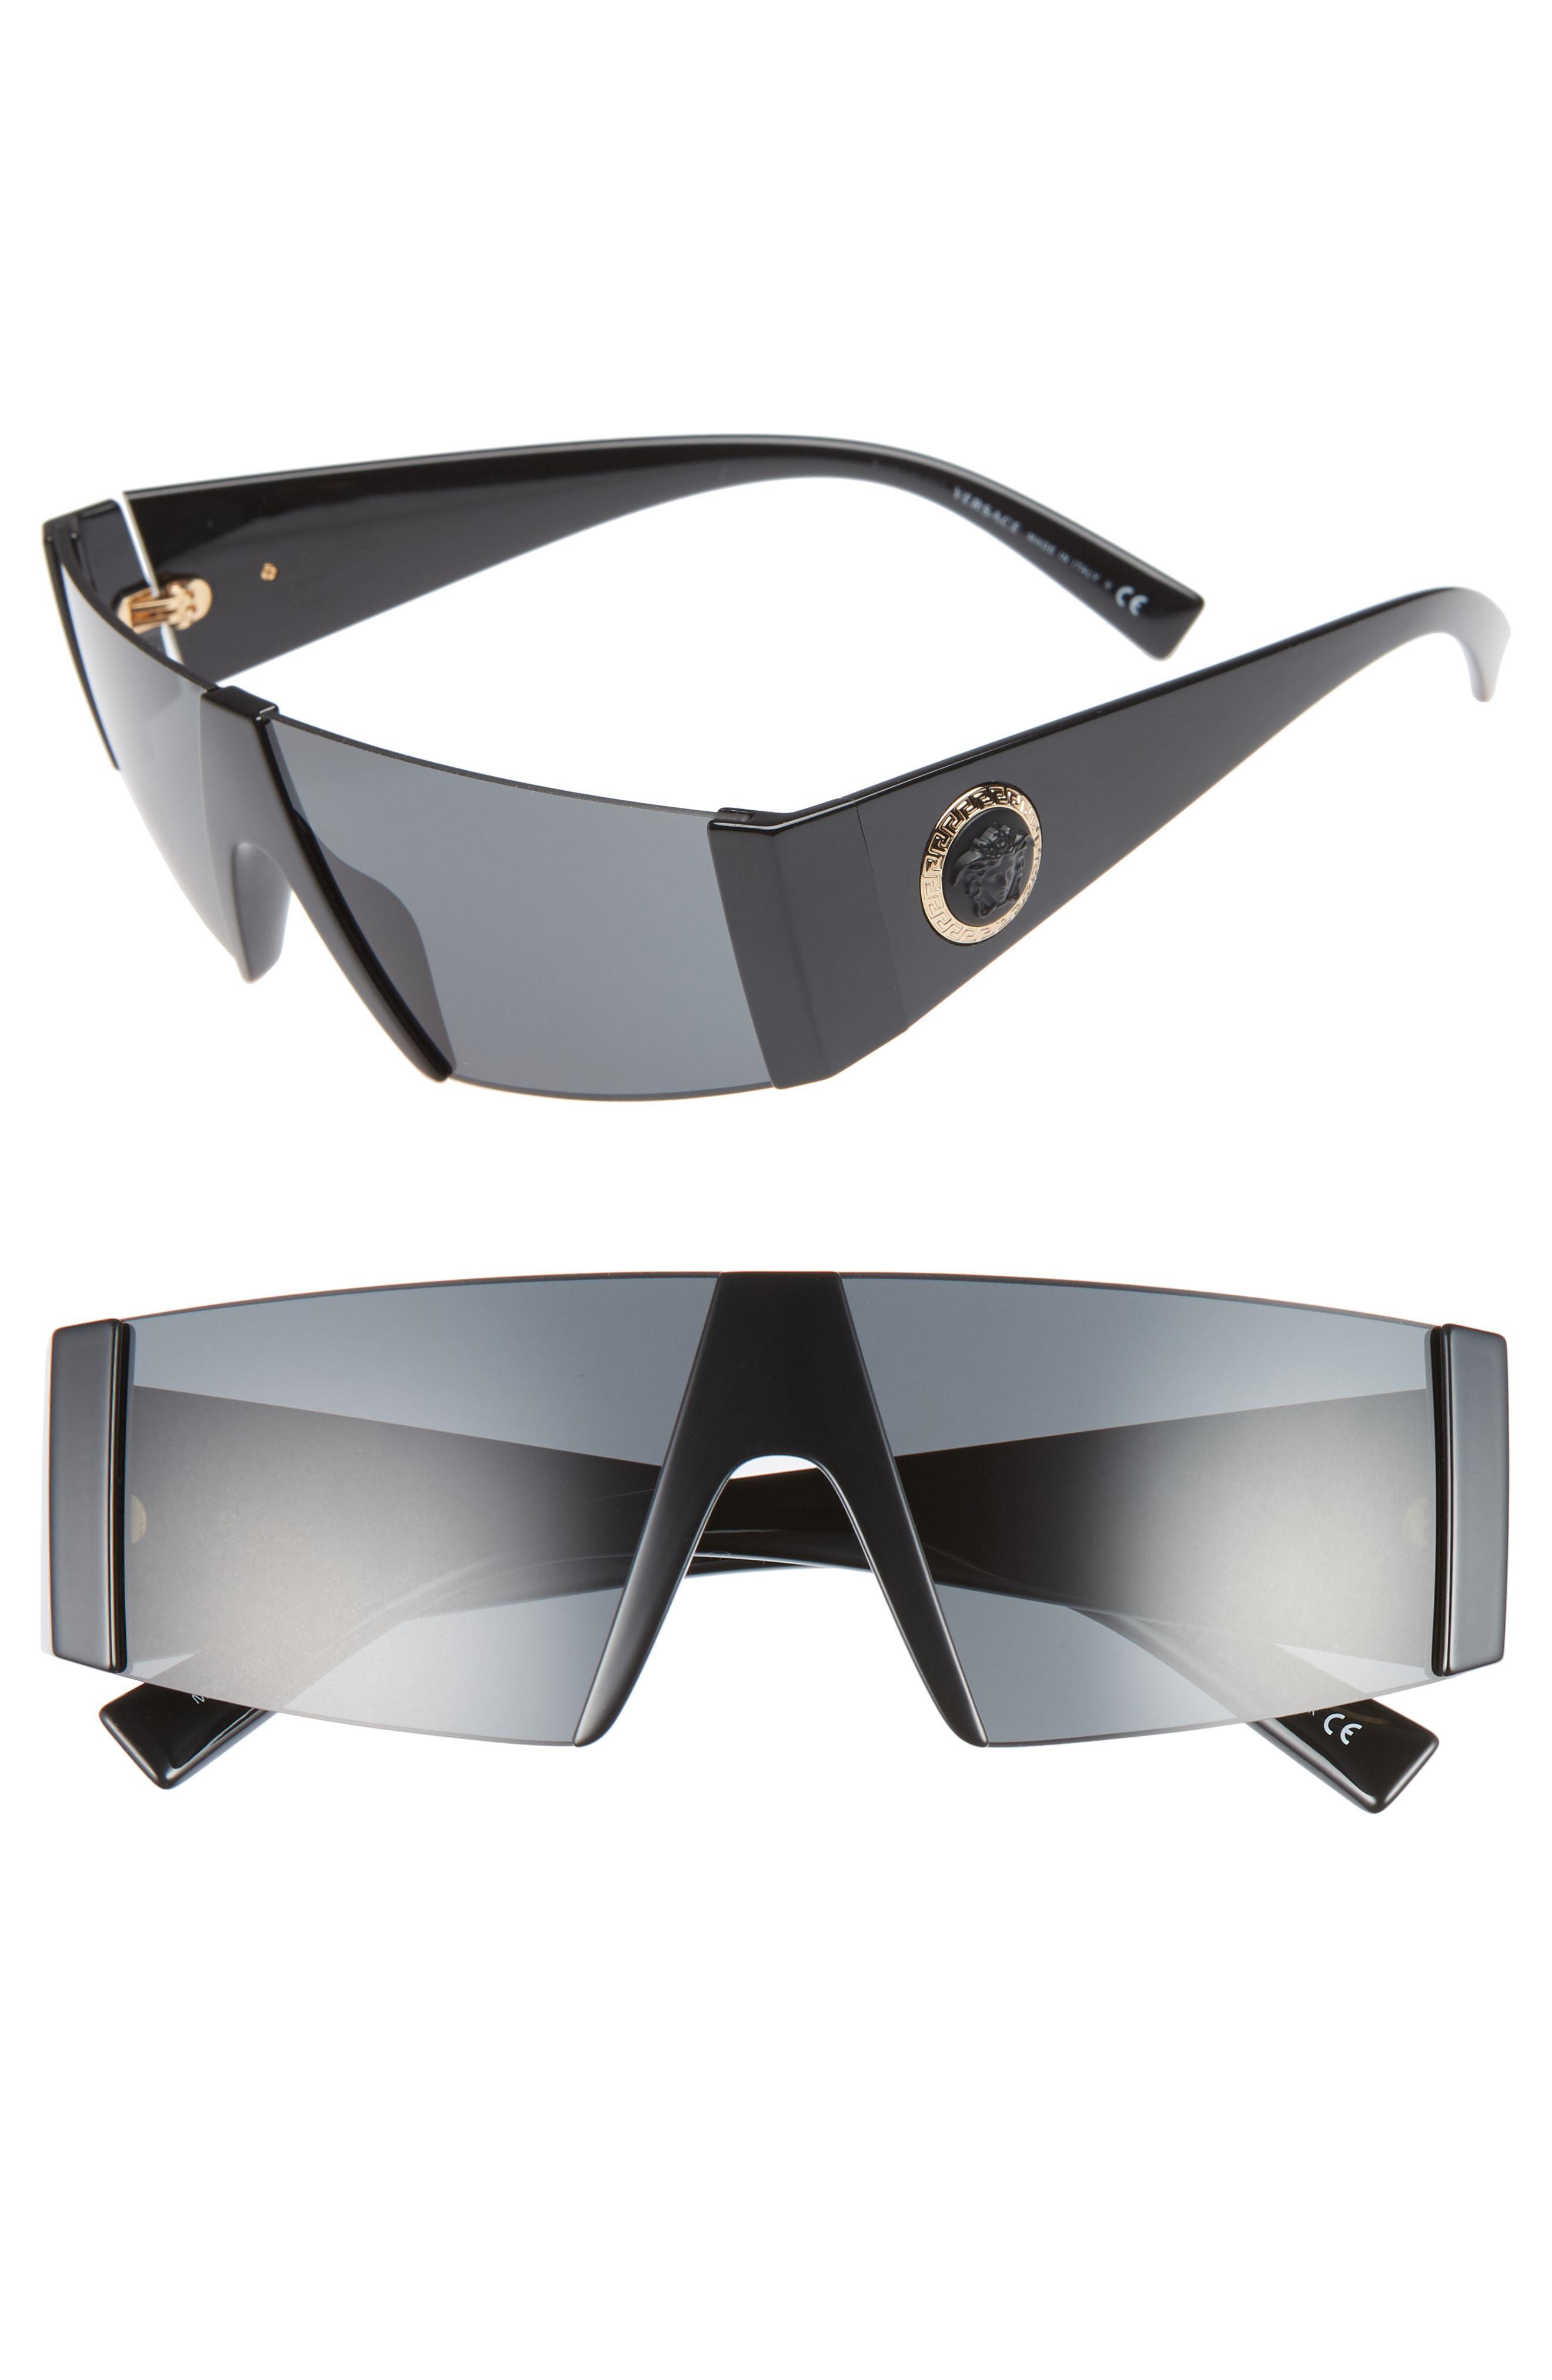 57aaa4b435 Lyst - Versace Medusa 56mm Shield Sunglasses in Black